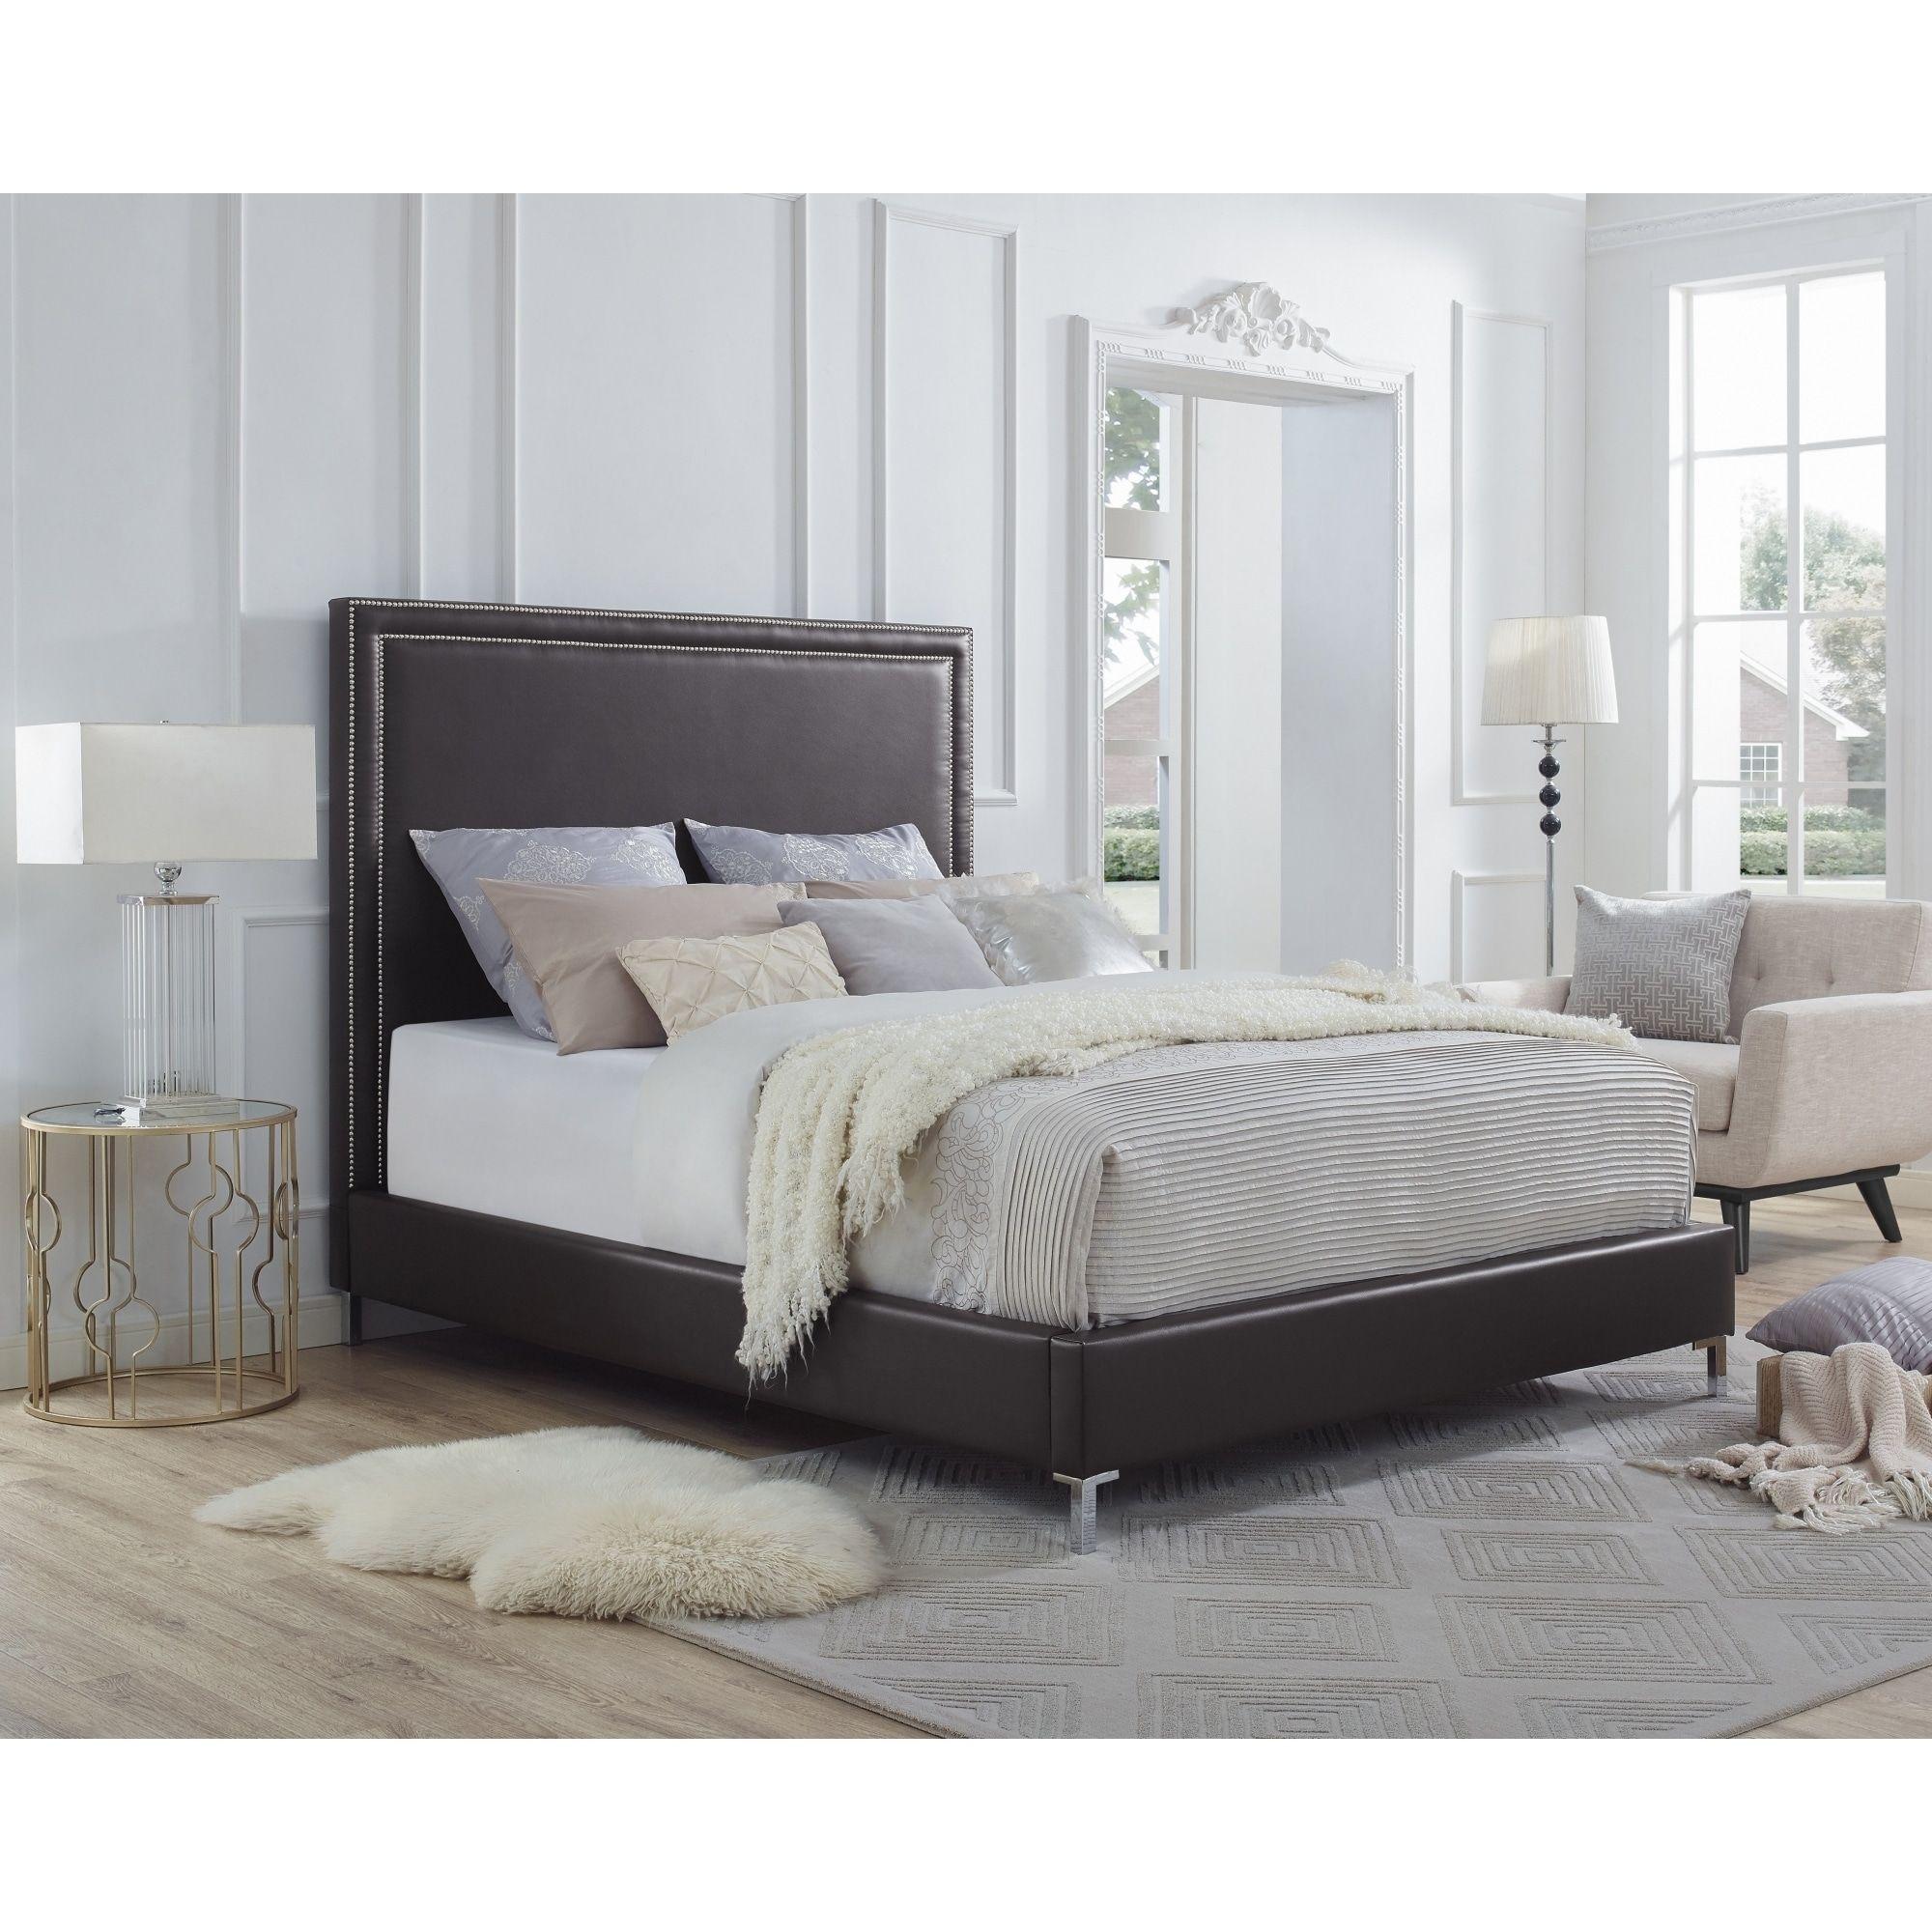 Hayworth PU Leather or Velvet Nailhead Trim Platform Bed